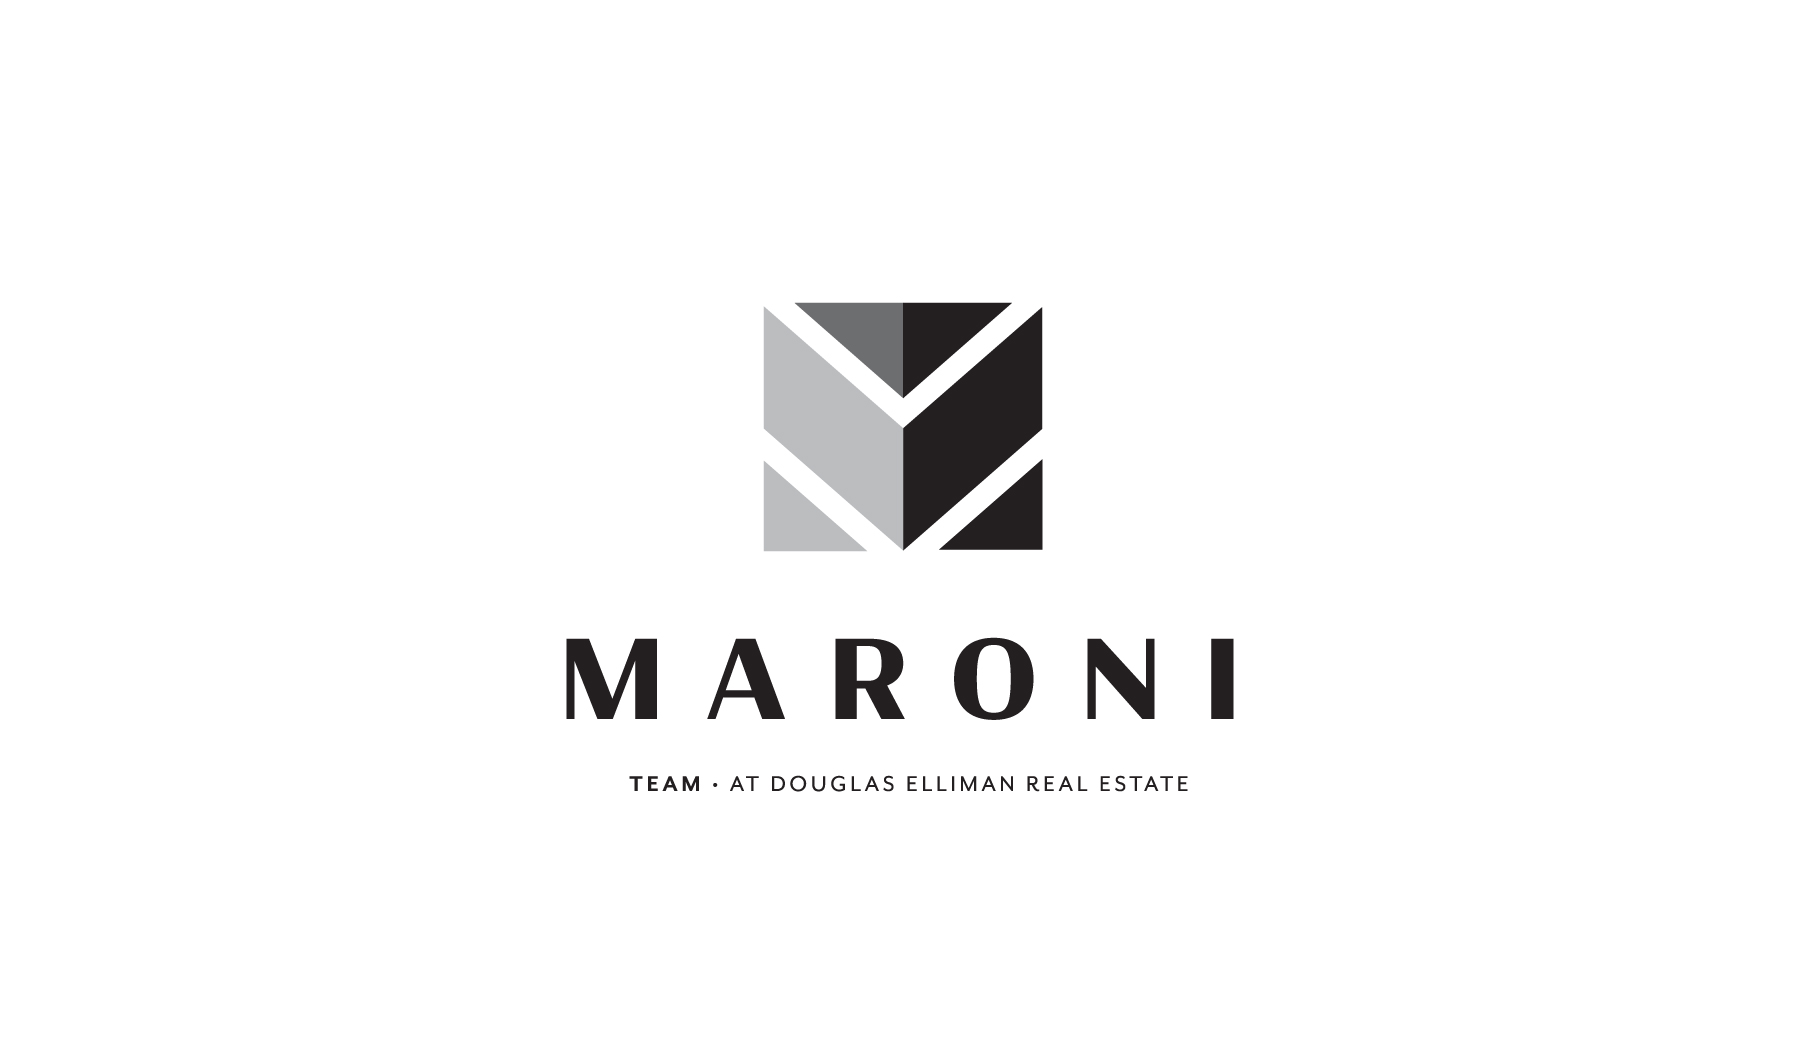 logo compilation_maroni-43.jpg